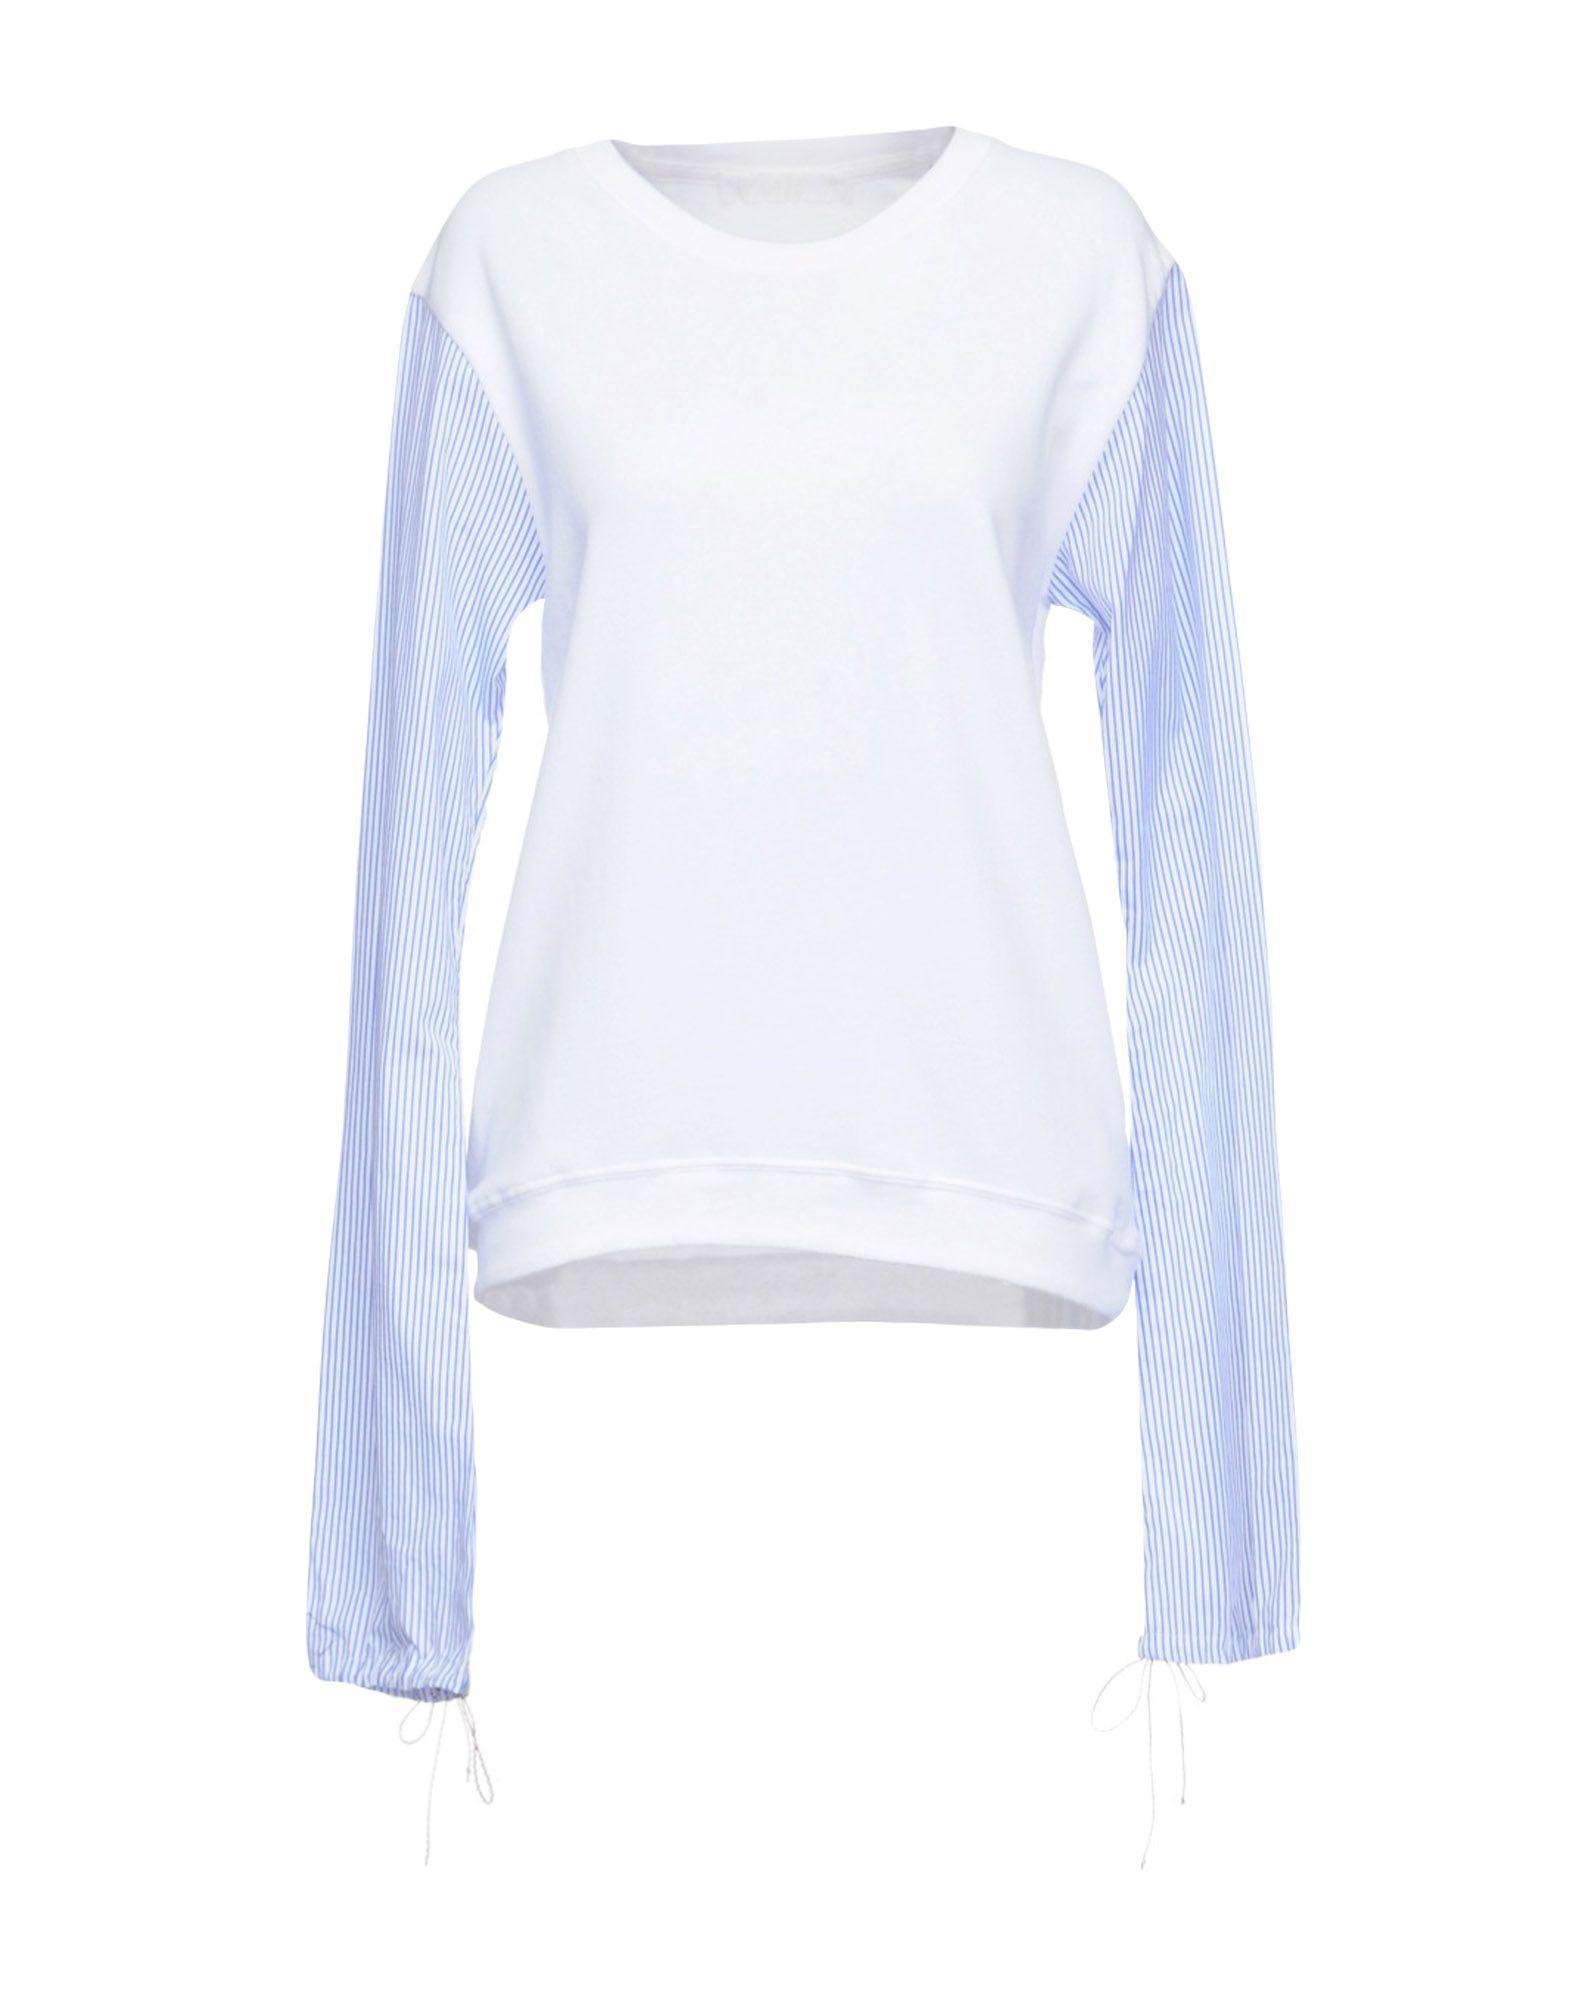 WATER Sweatshirt in White